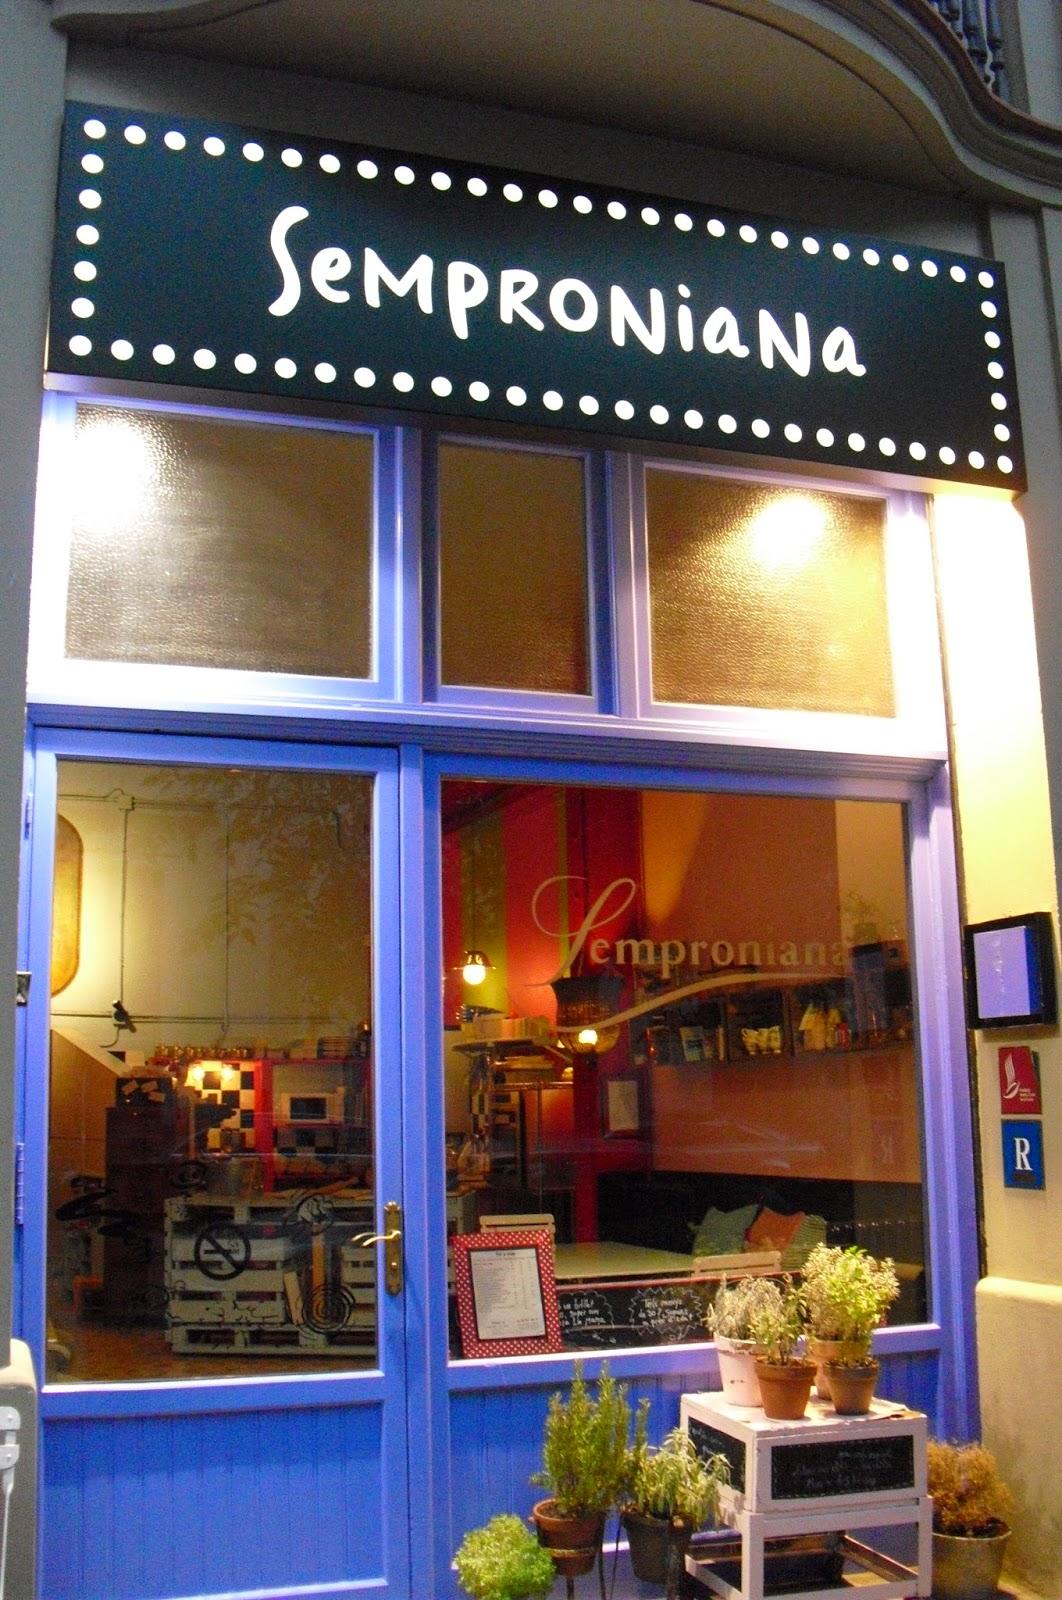 Restaurante Semproniana Barcelona ~ Restaurant Semproniana Barcelona